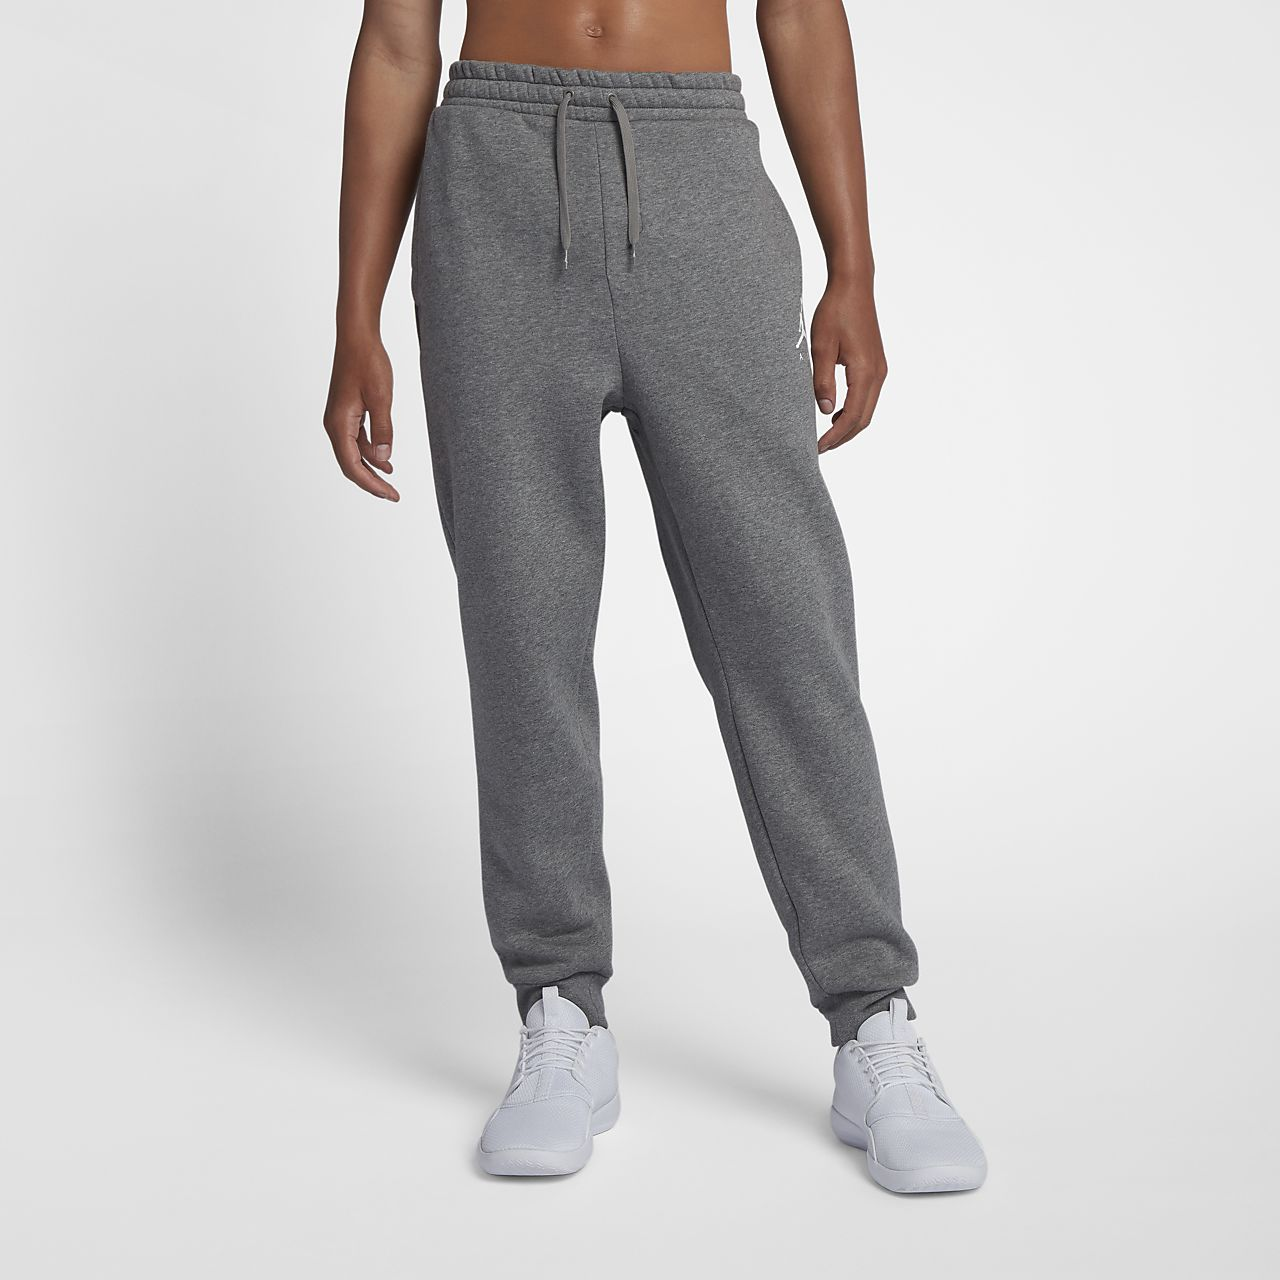 Jordan Jumpman Air Men s Fleece Trousers. Nike.com GB 5bb865c713c5